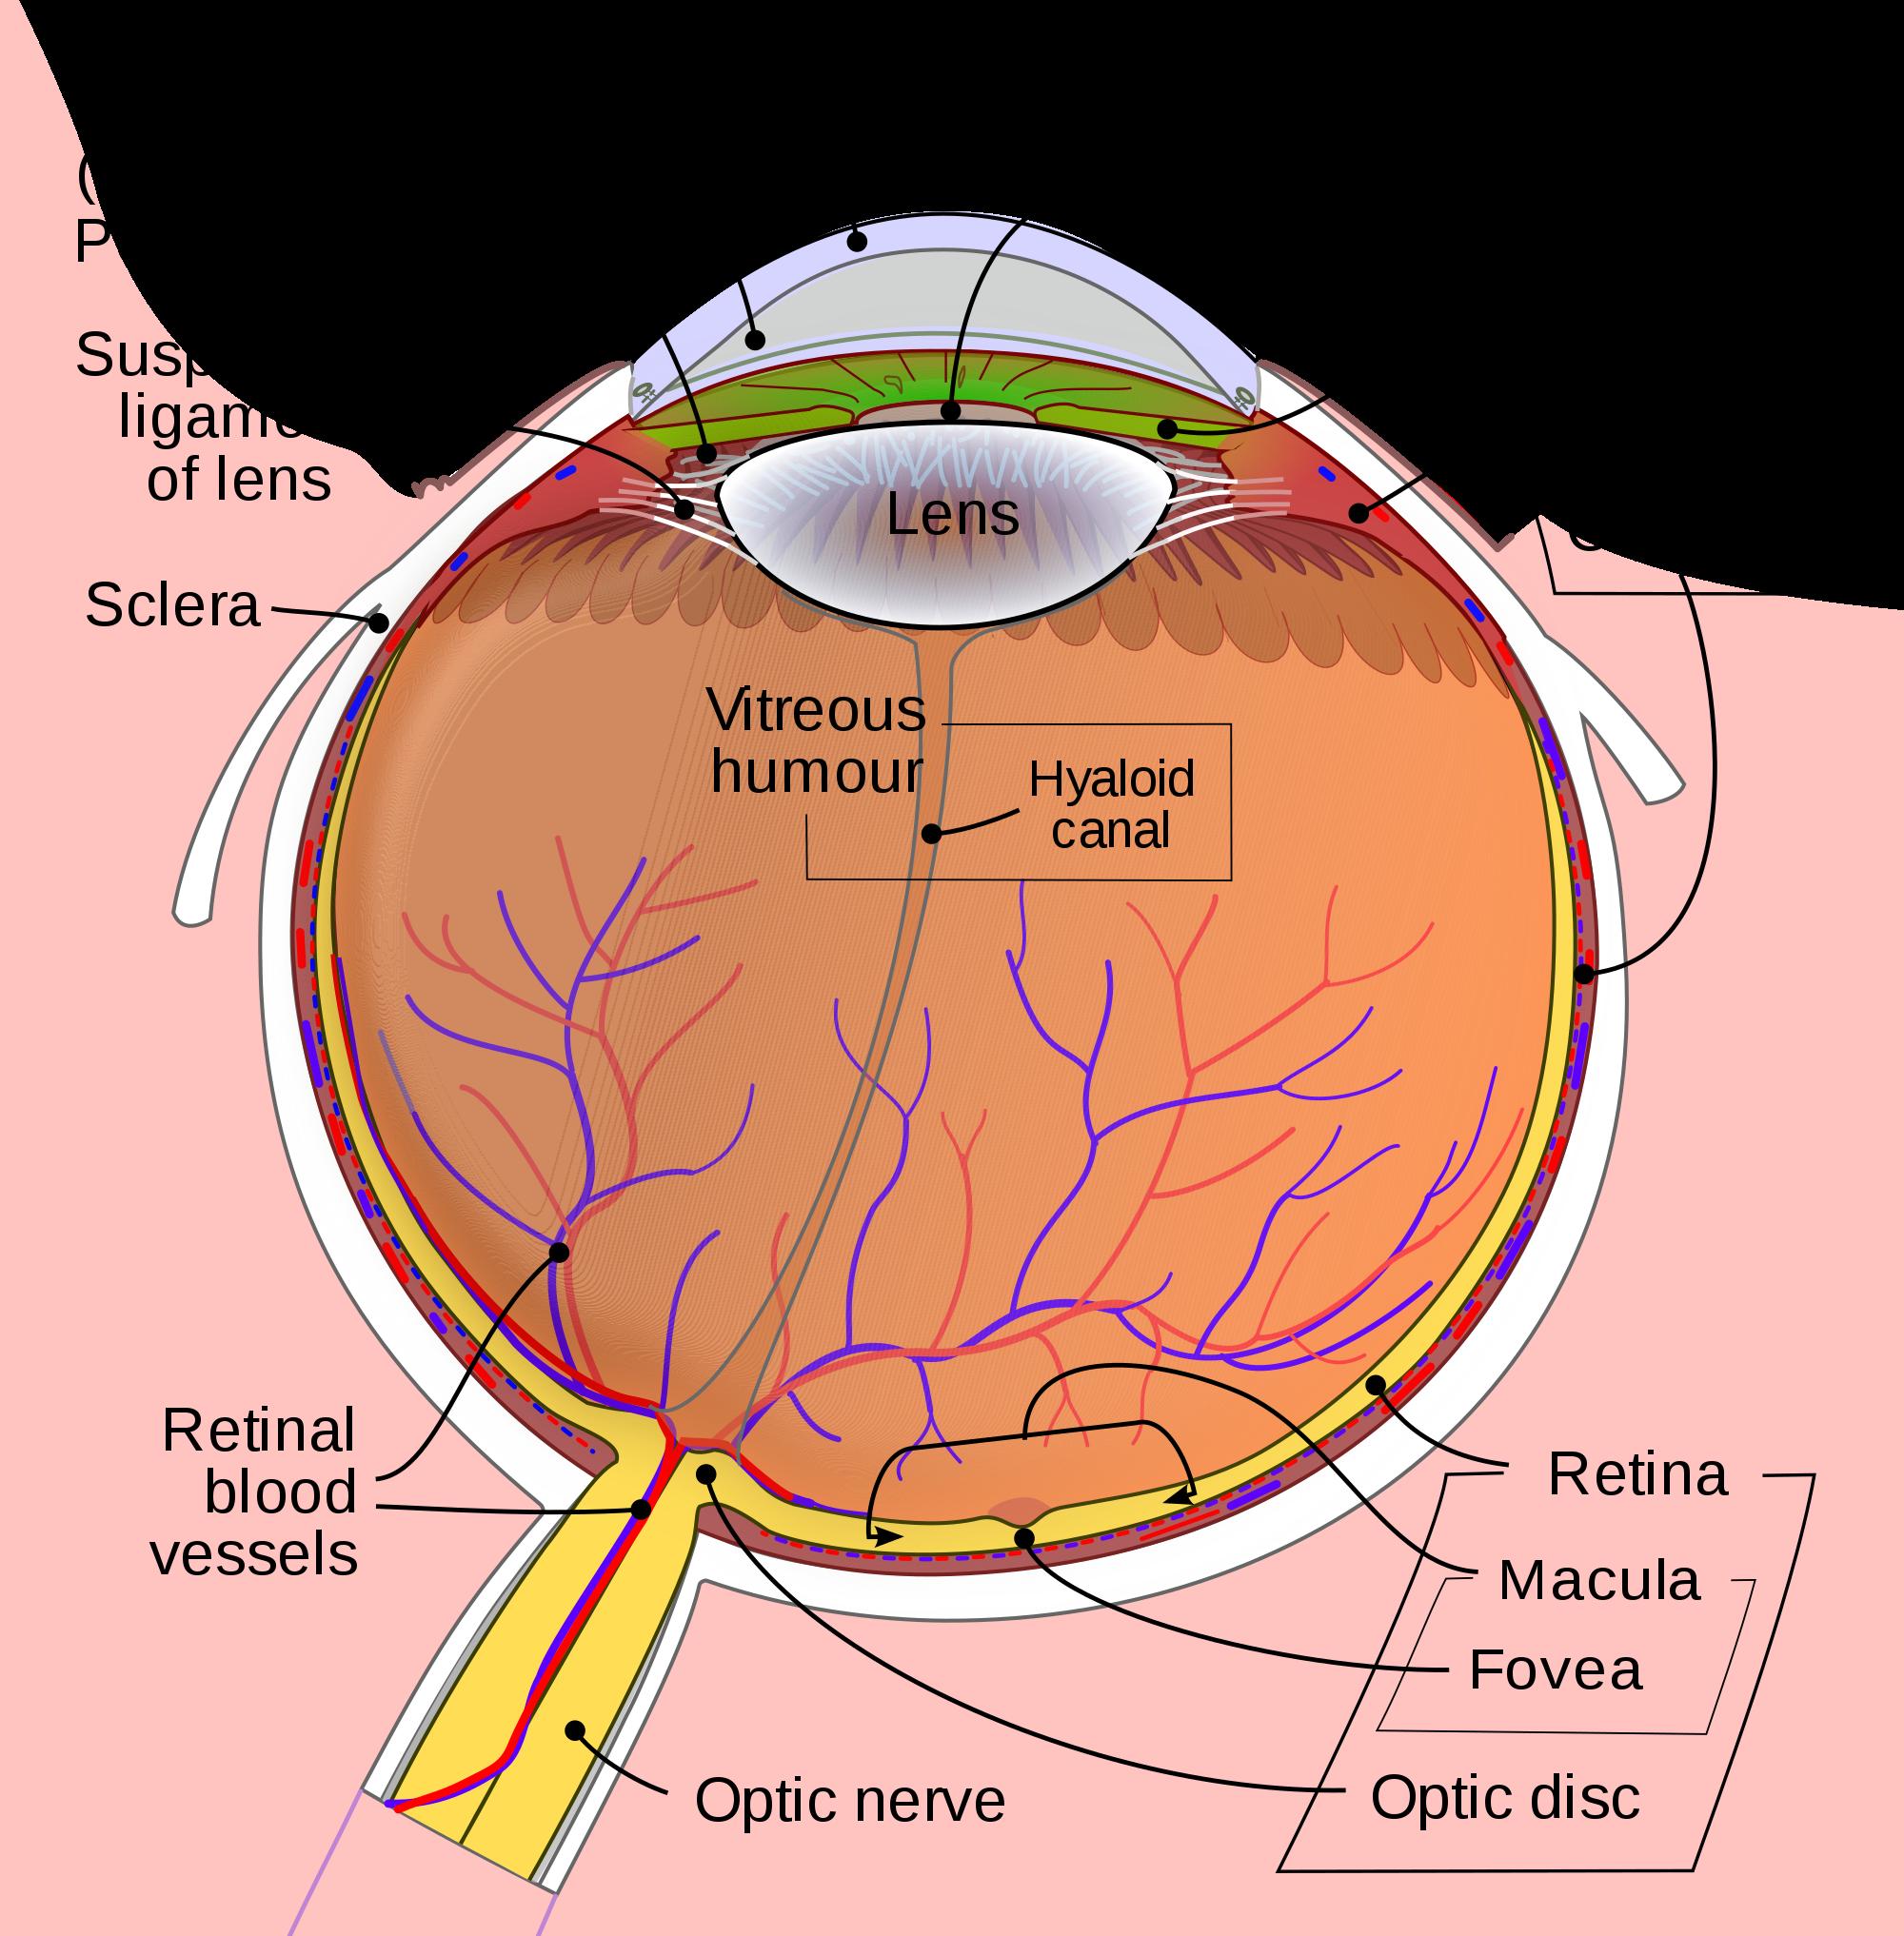 Figure 1. Anatomy of the Eye. Courtesy of Wikimedia Commons.